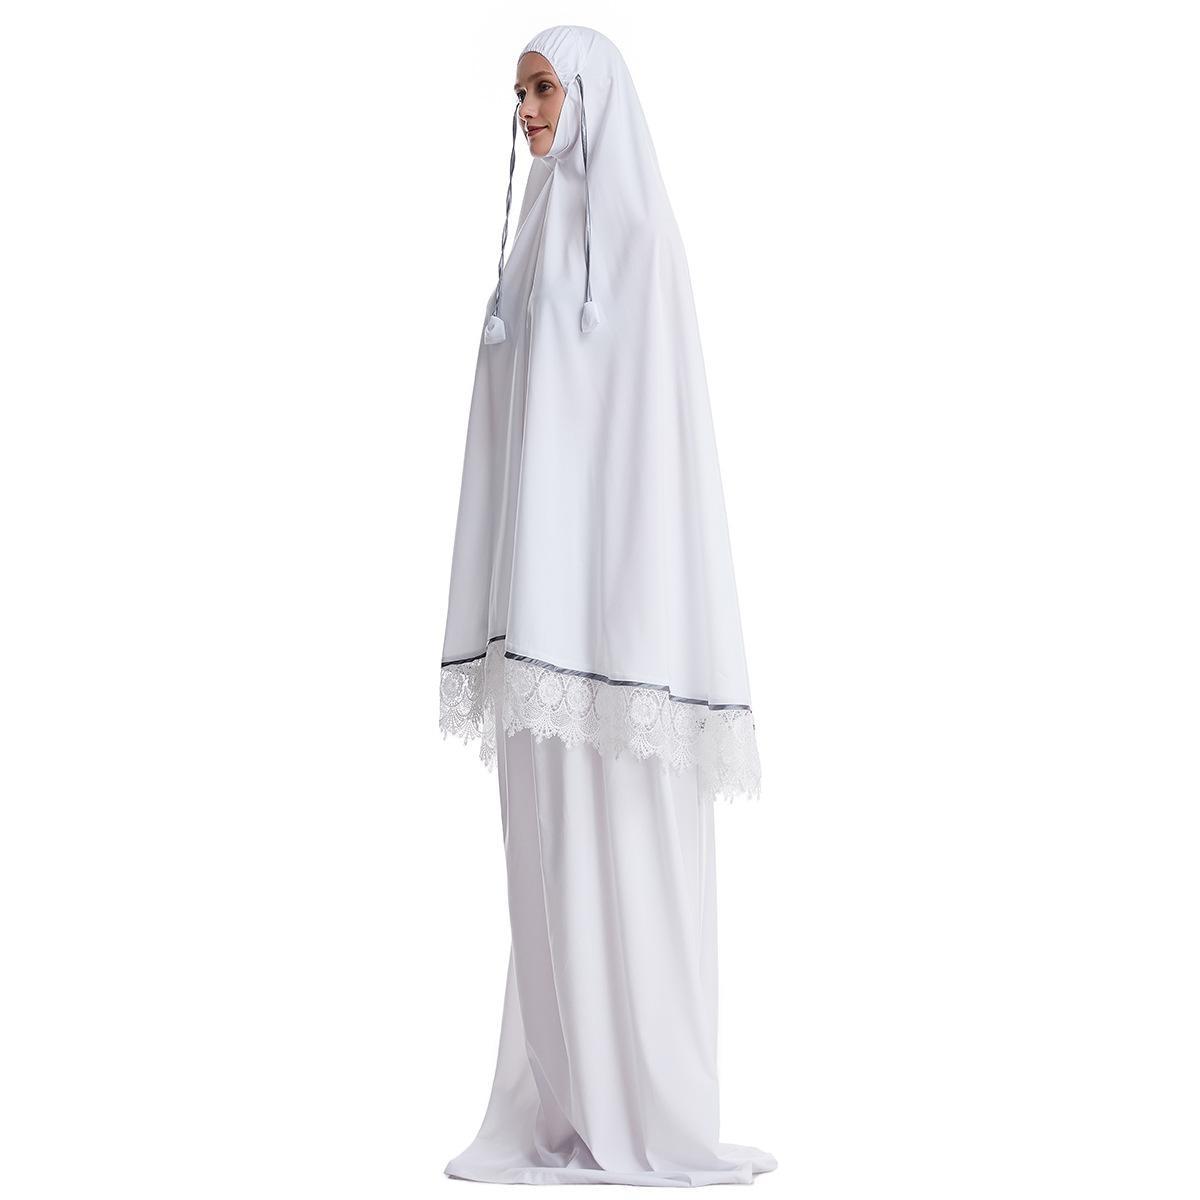 Ramadan Women 2 Piece Muslim Prayer Set Khimar Abaya Overhead Hijab+Skirt Full Cover Islam Clothing Middle East Worship Service